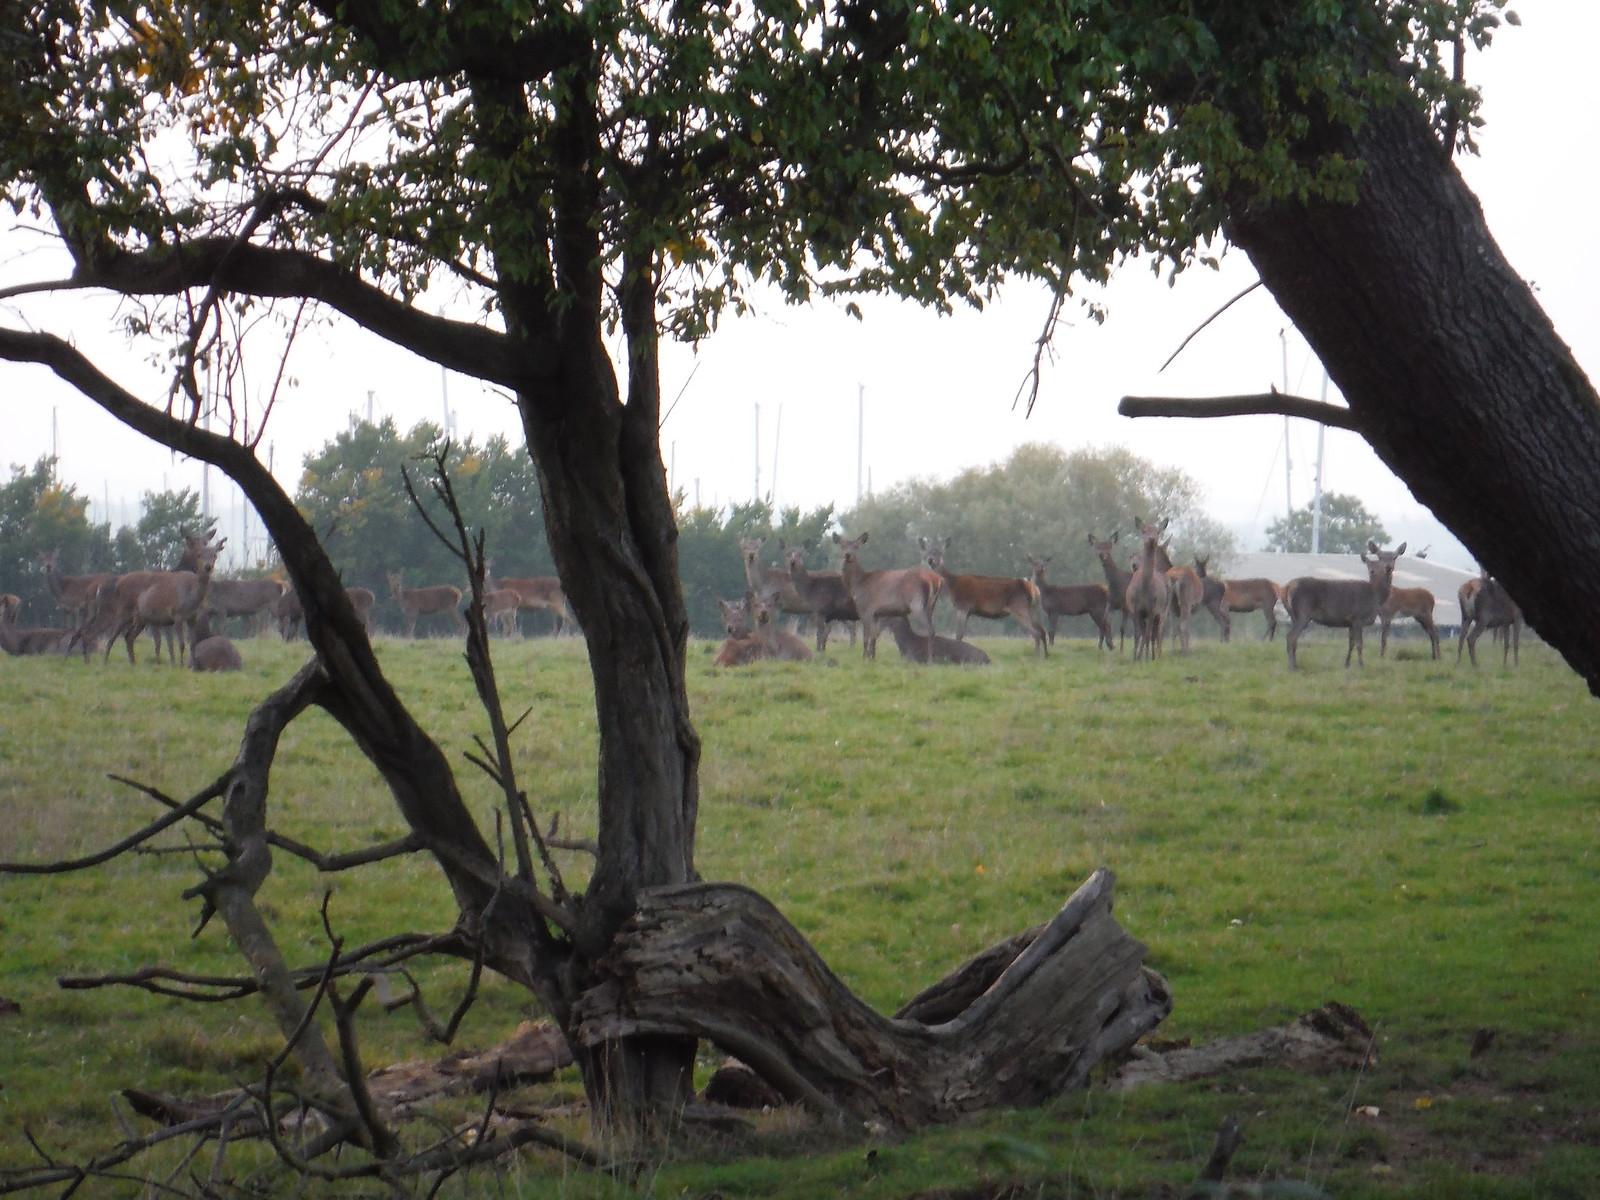 Deer in field next to North Fambridge Church SWC Walk 159 South Woodham Ferrers to North Fambridge